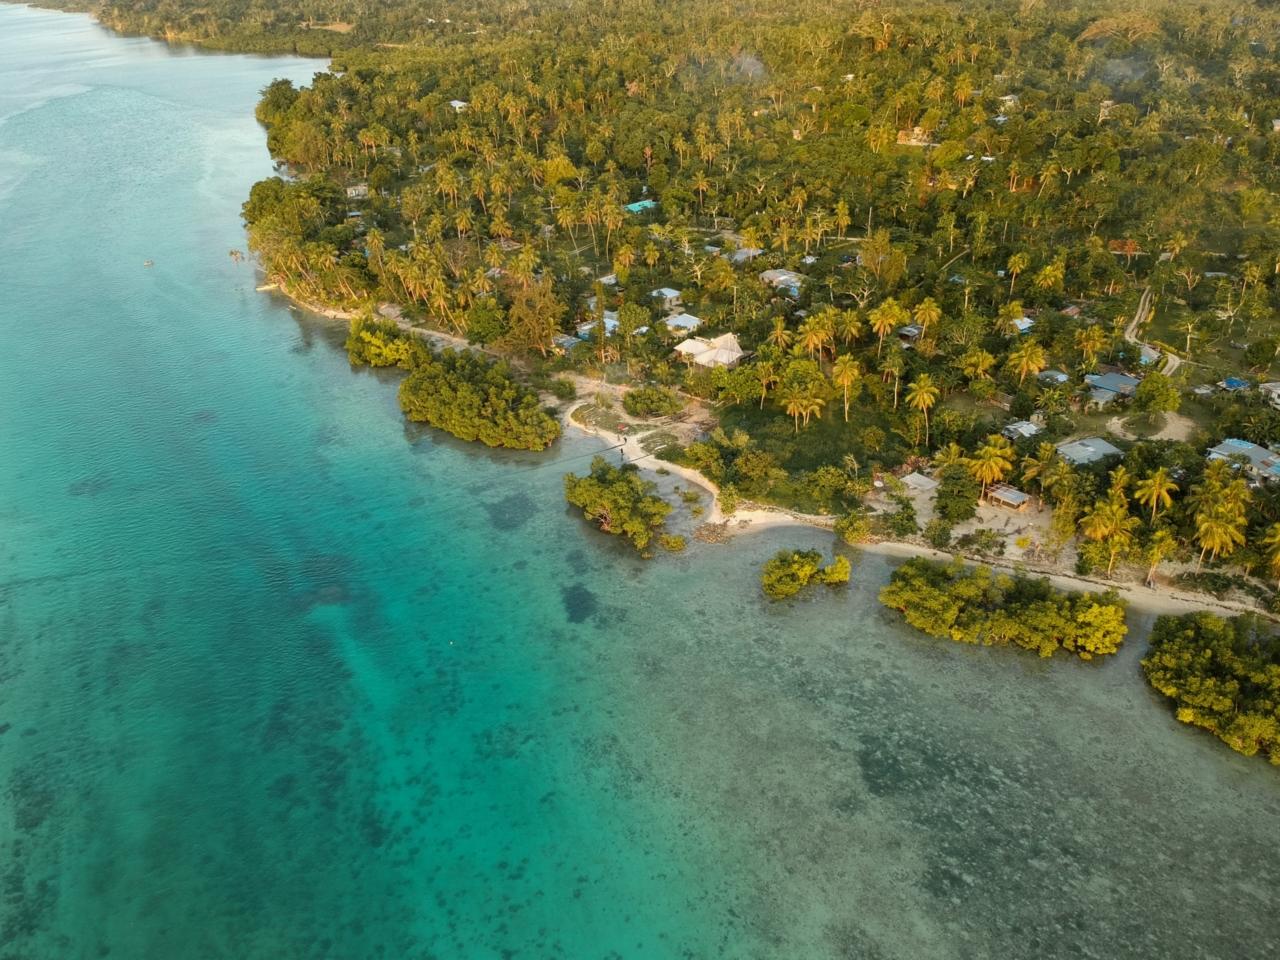 Vanuatu Citizenship By Investment Program 2022